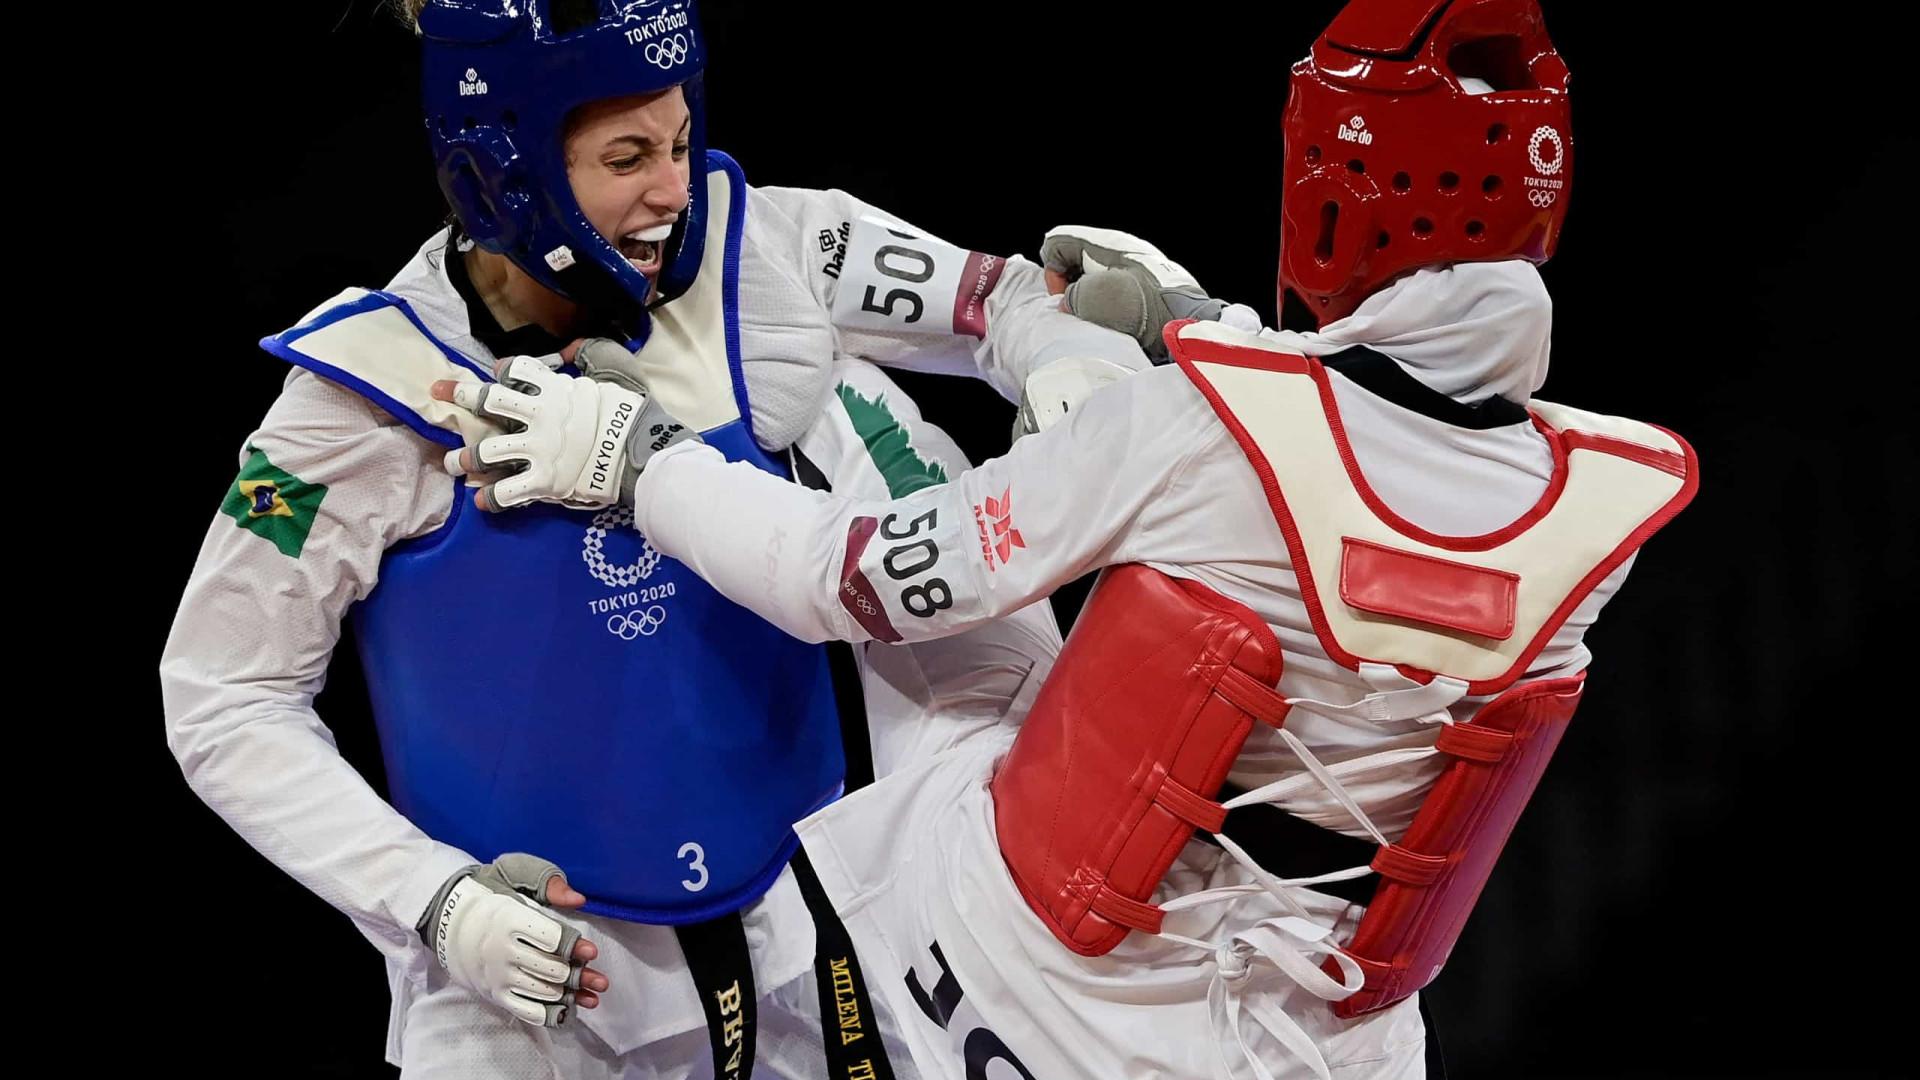 Milena Titoneli perde de marfinense e fica sem medalha de bronze no tae kwon do